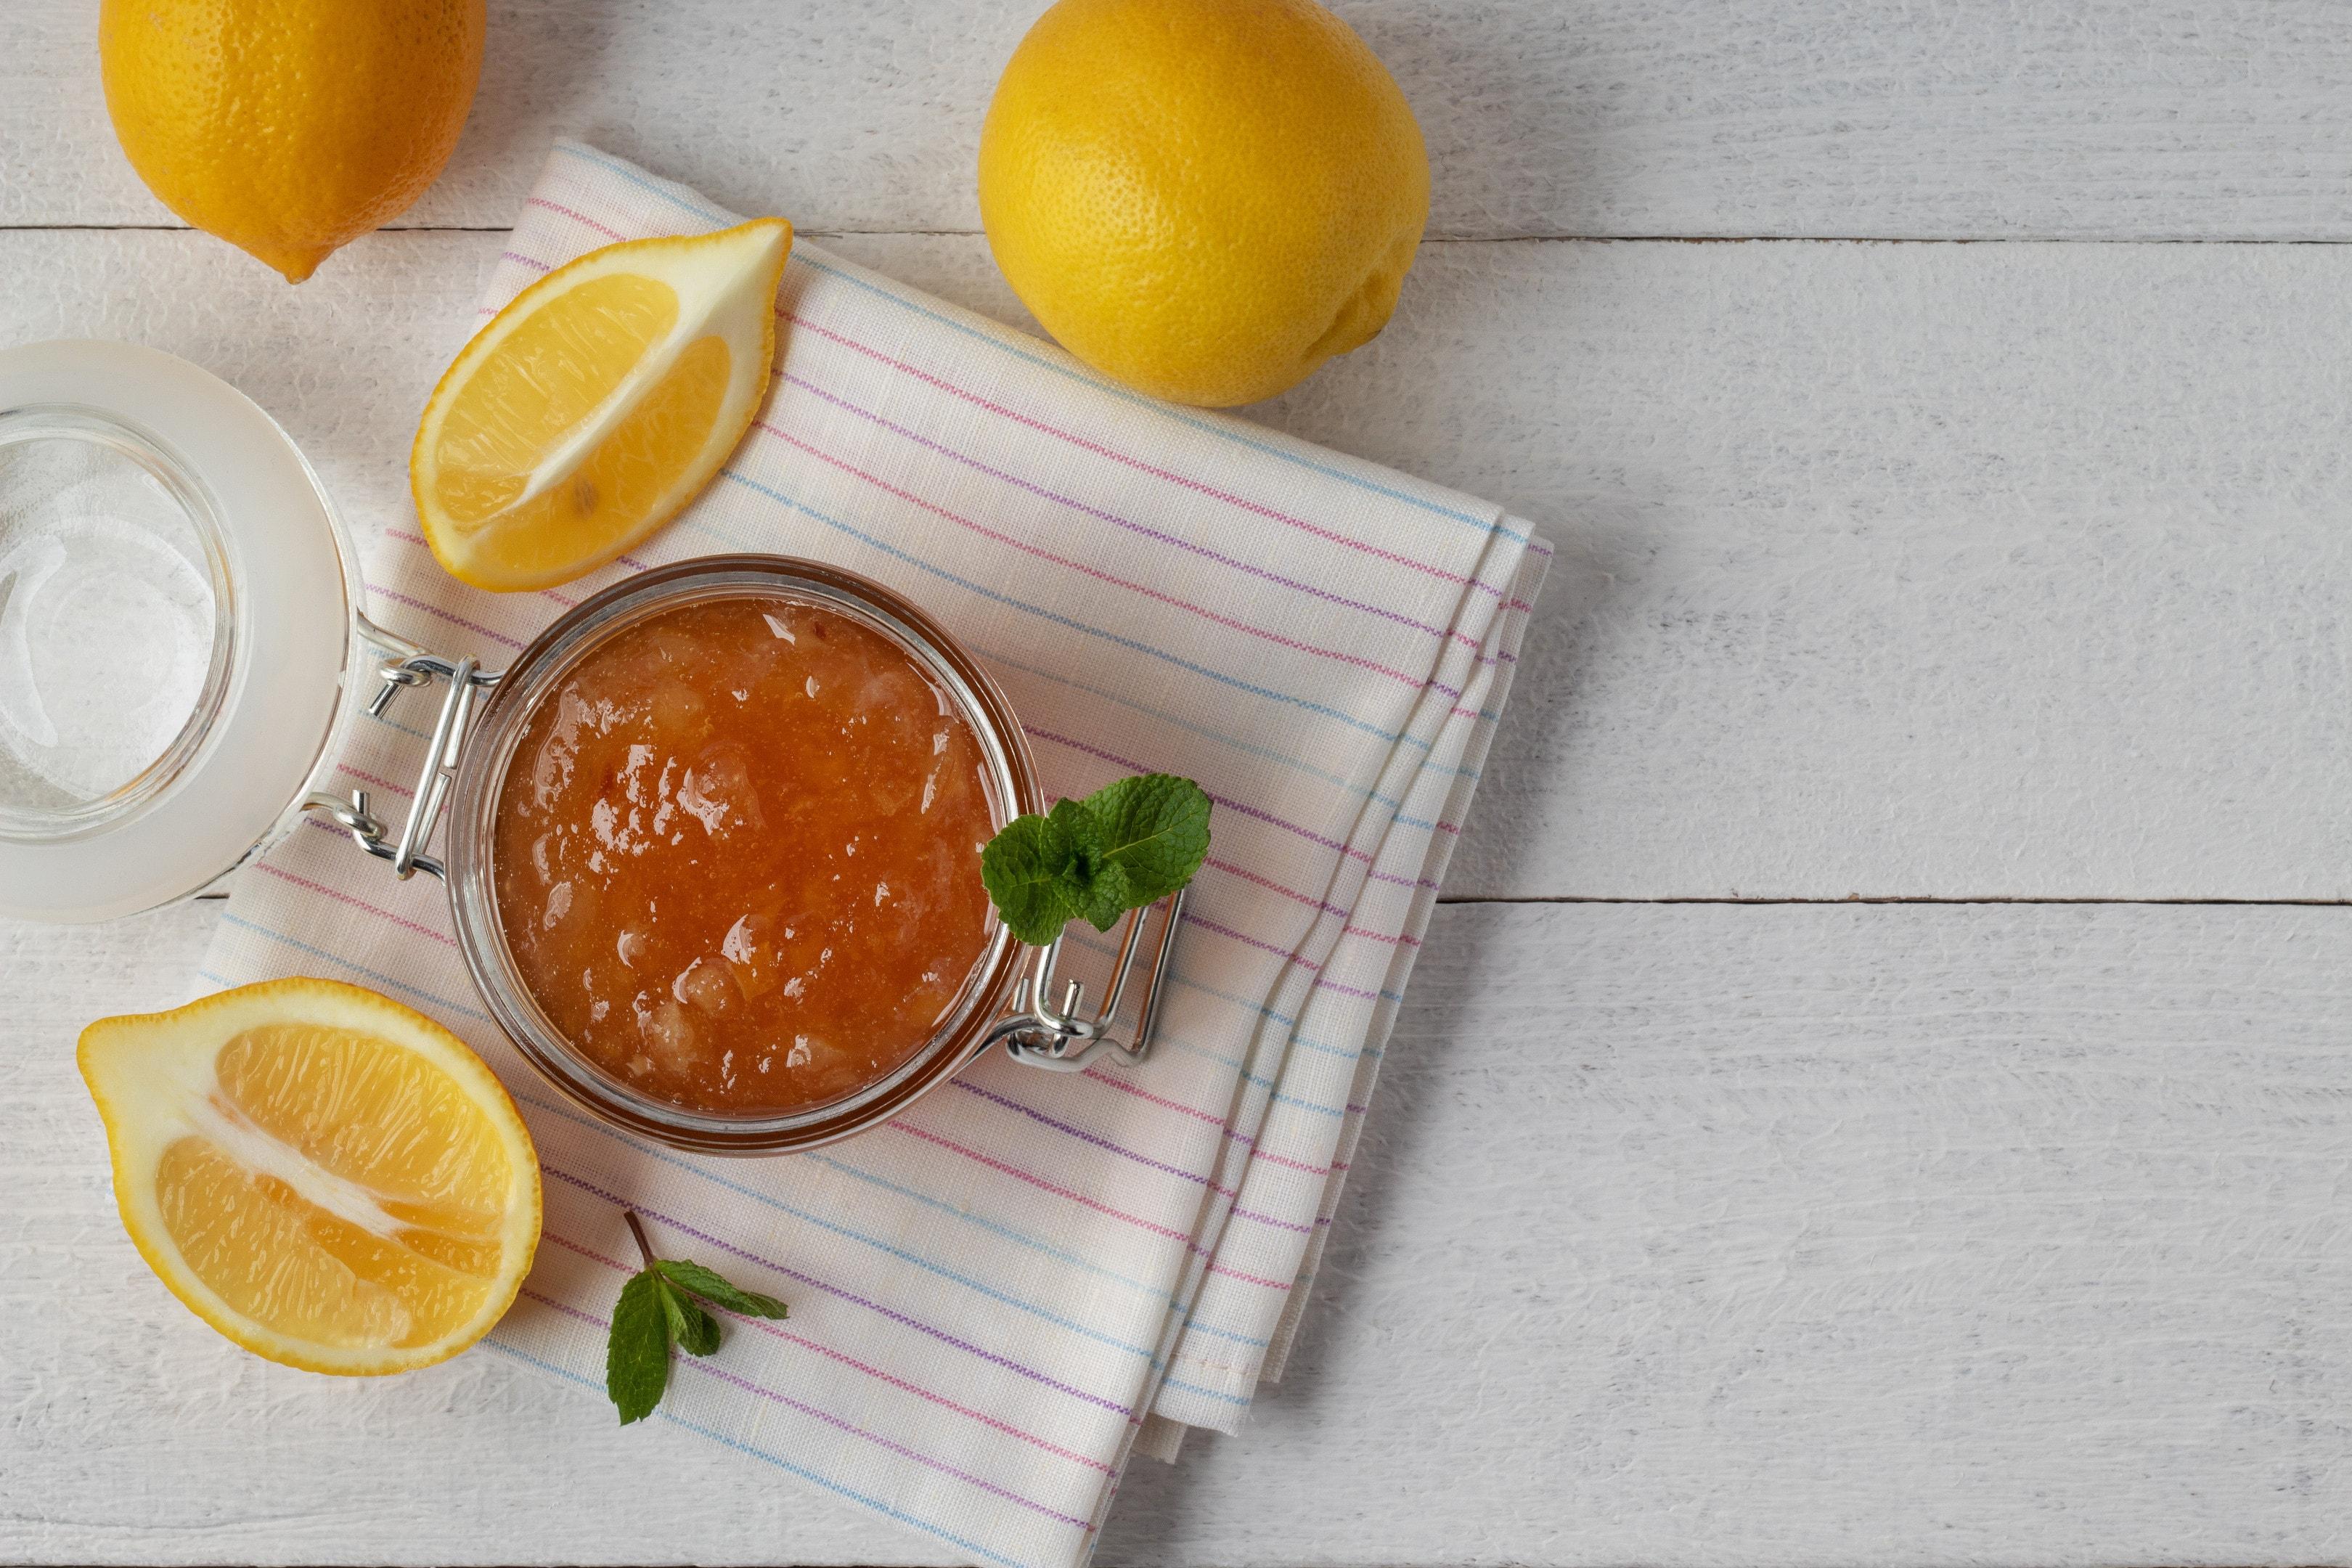 Citrus marmalade in a jar